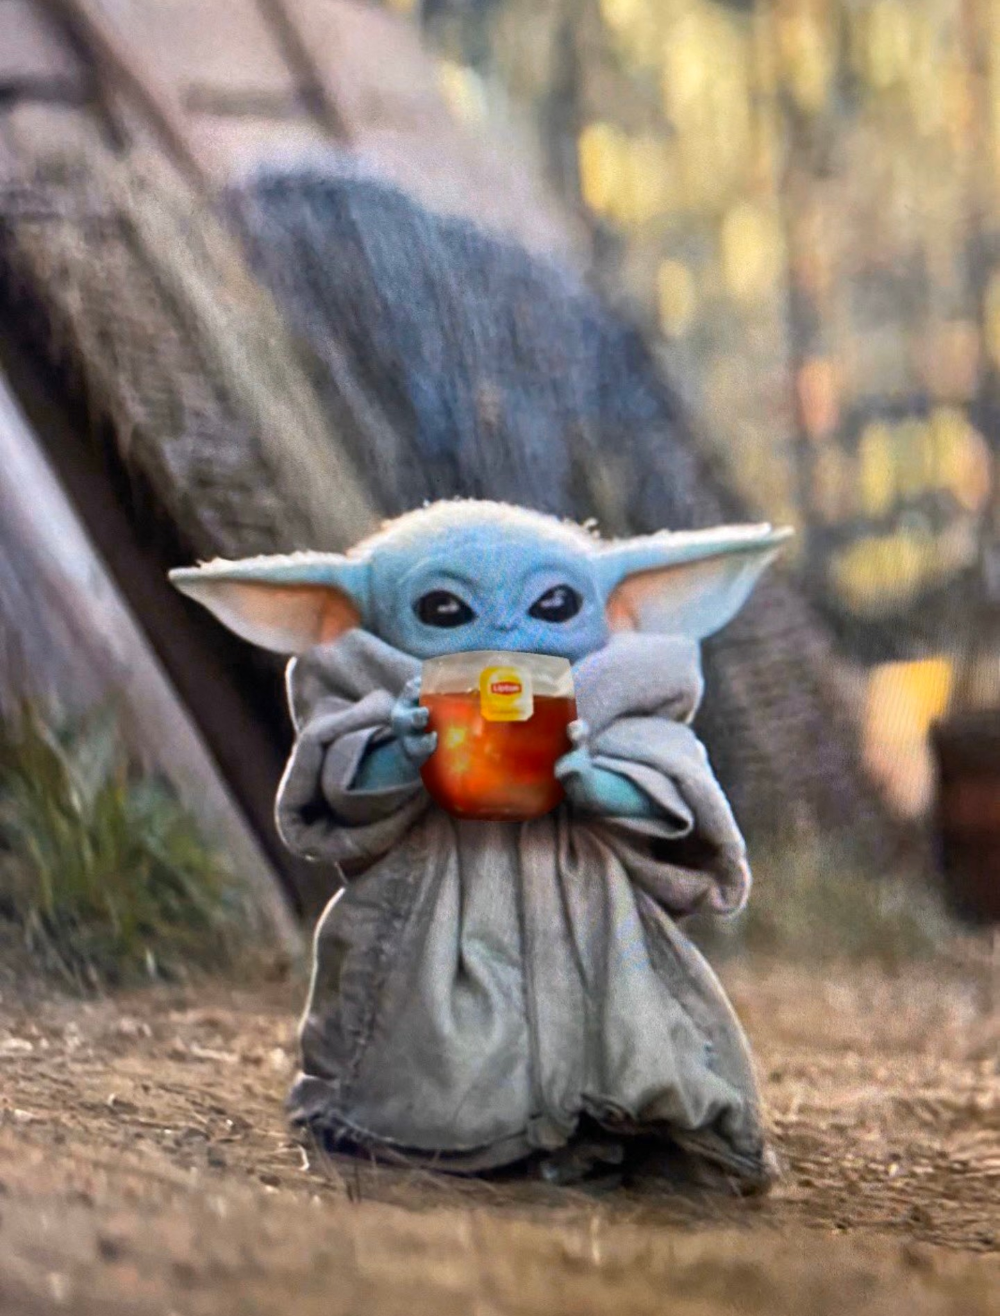 Baby Yoda Tea Blank Template Imgflip Yoda Wallpaper Yoda Images Star Wars Baby